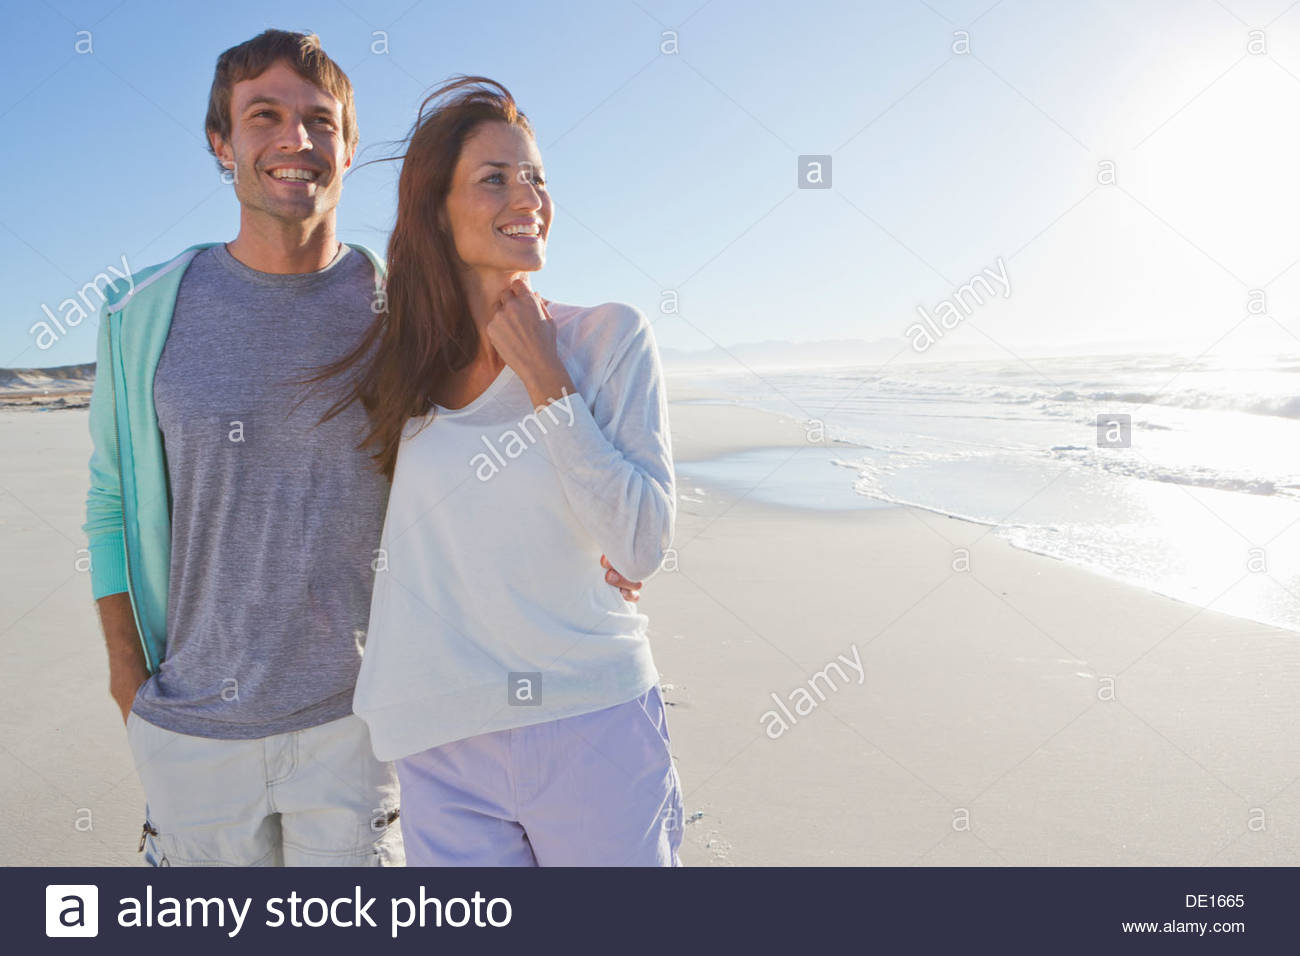 Happy couple on sunny beach - Stock Image